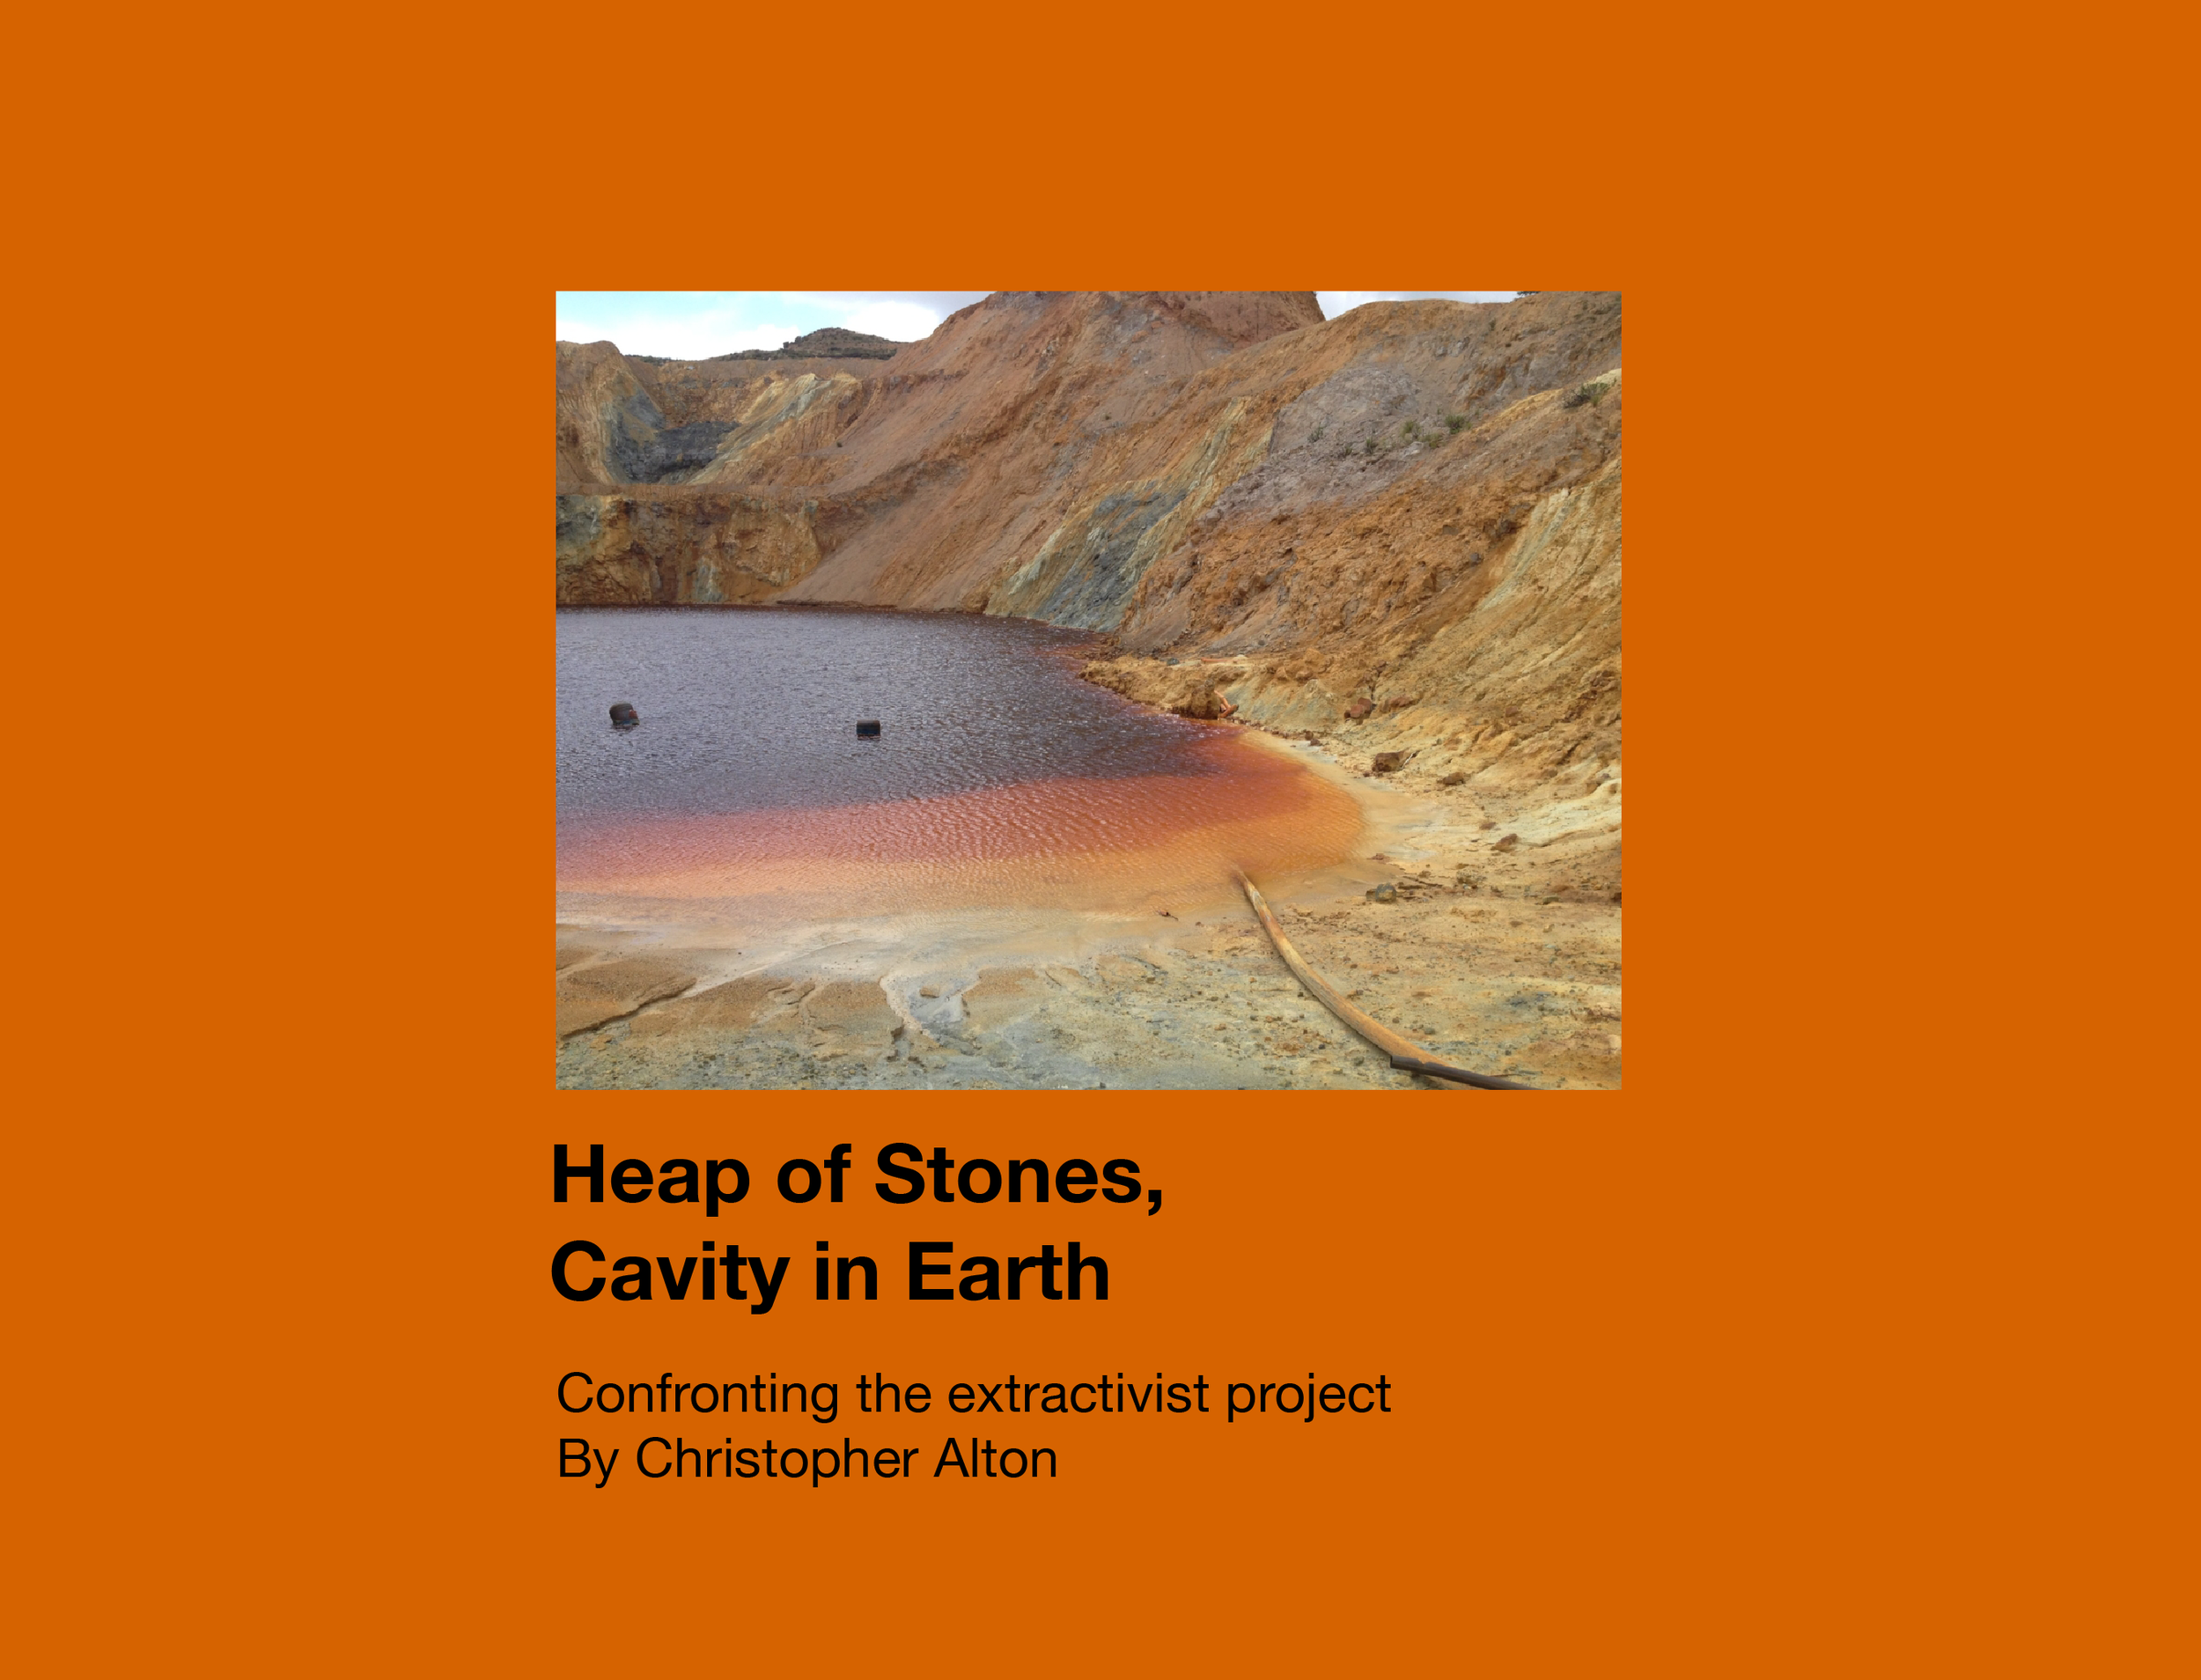 Heap of Stones, Cavity in Earth